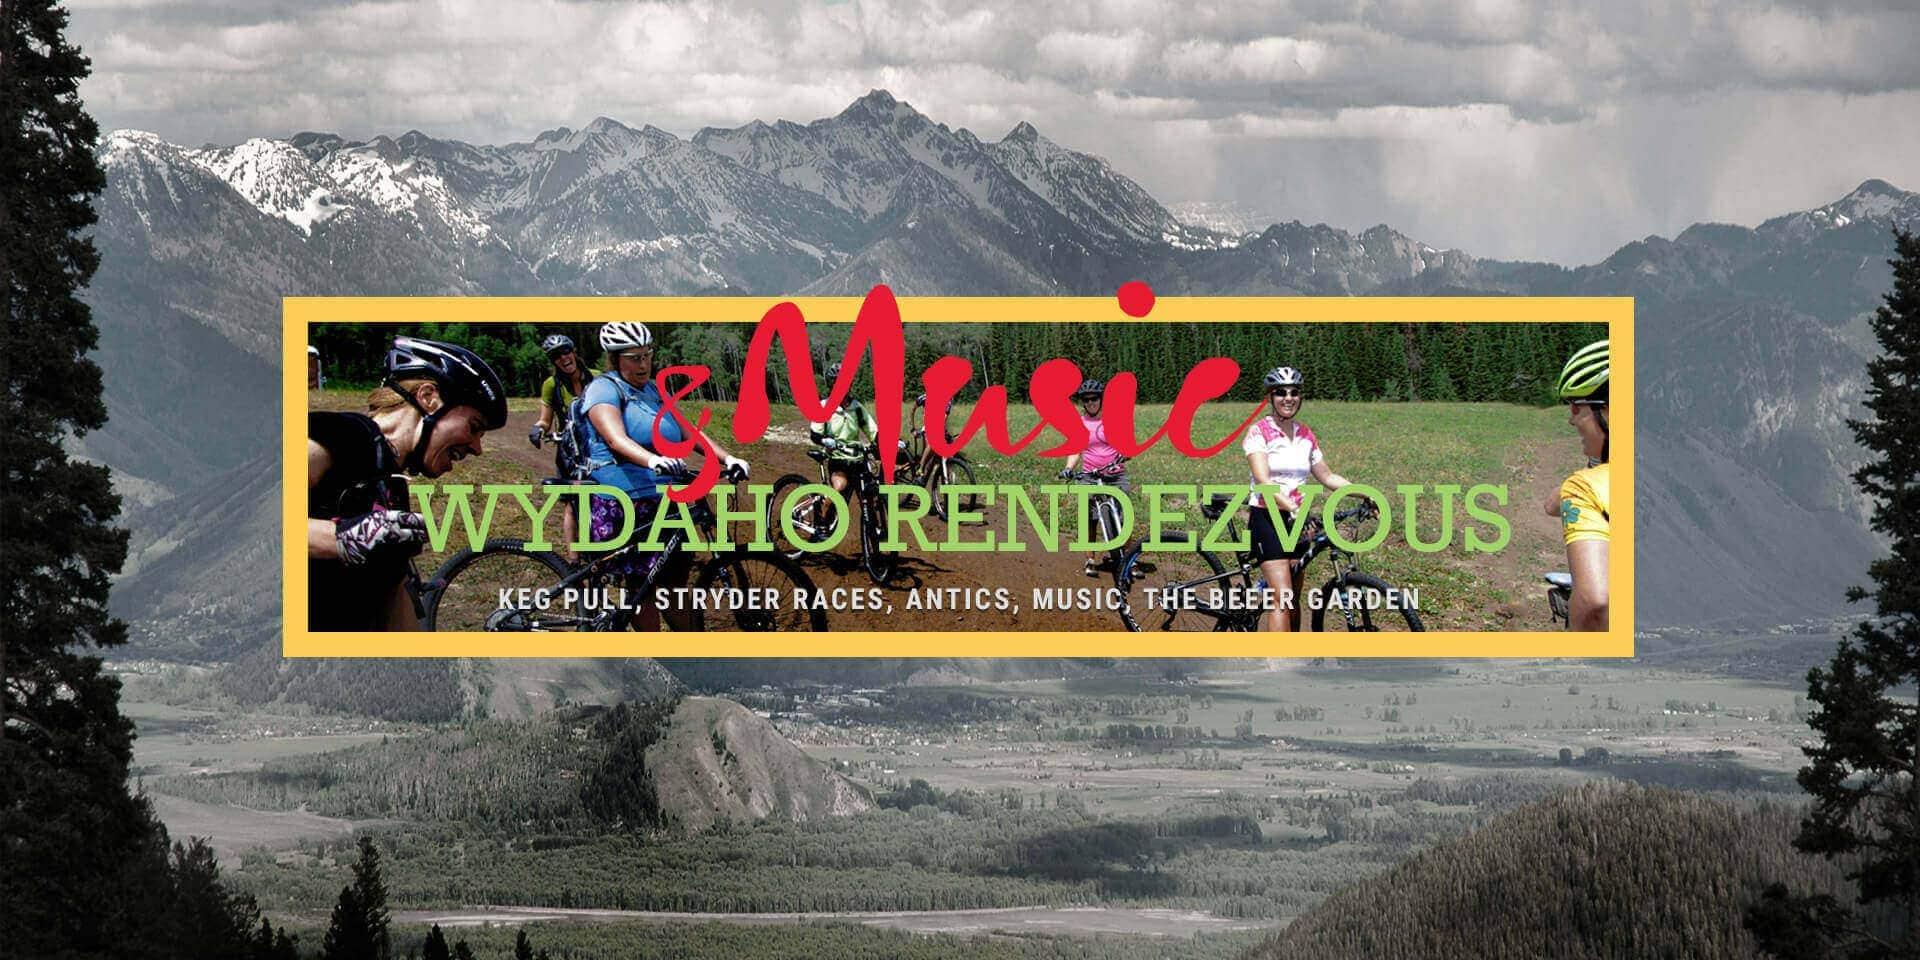 Wydaho-Rendezvous-Bike-Festival-Music-2